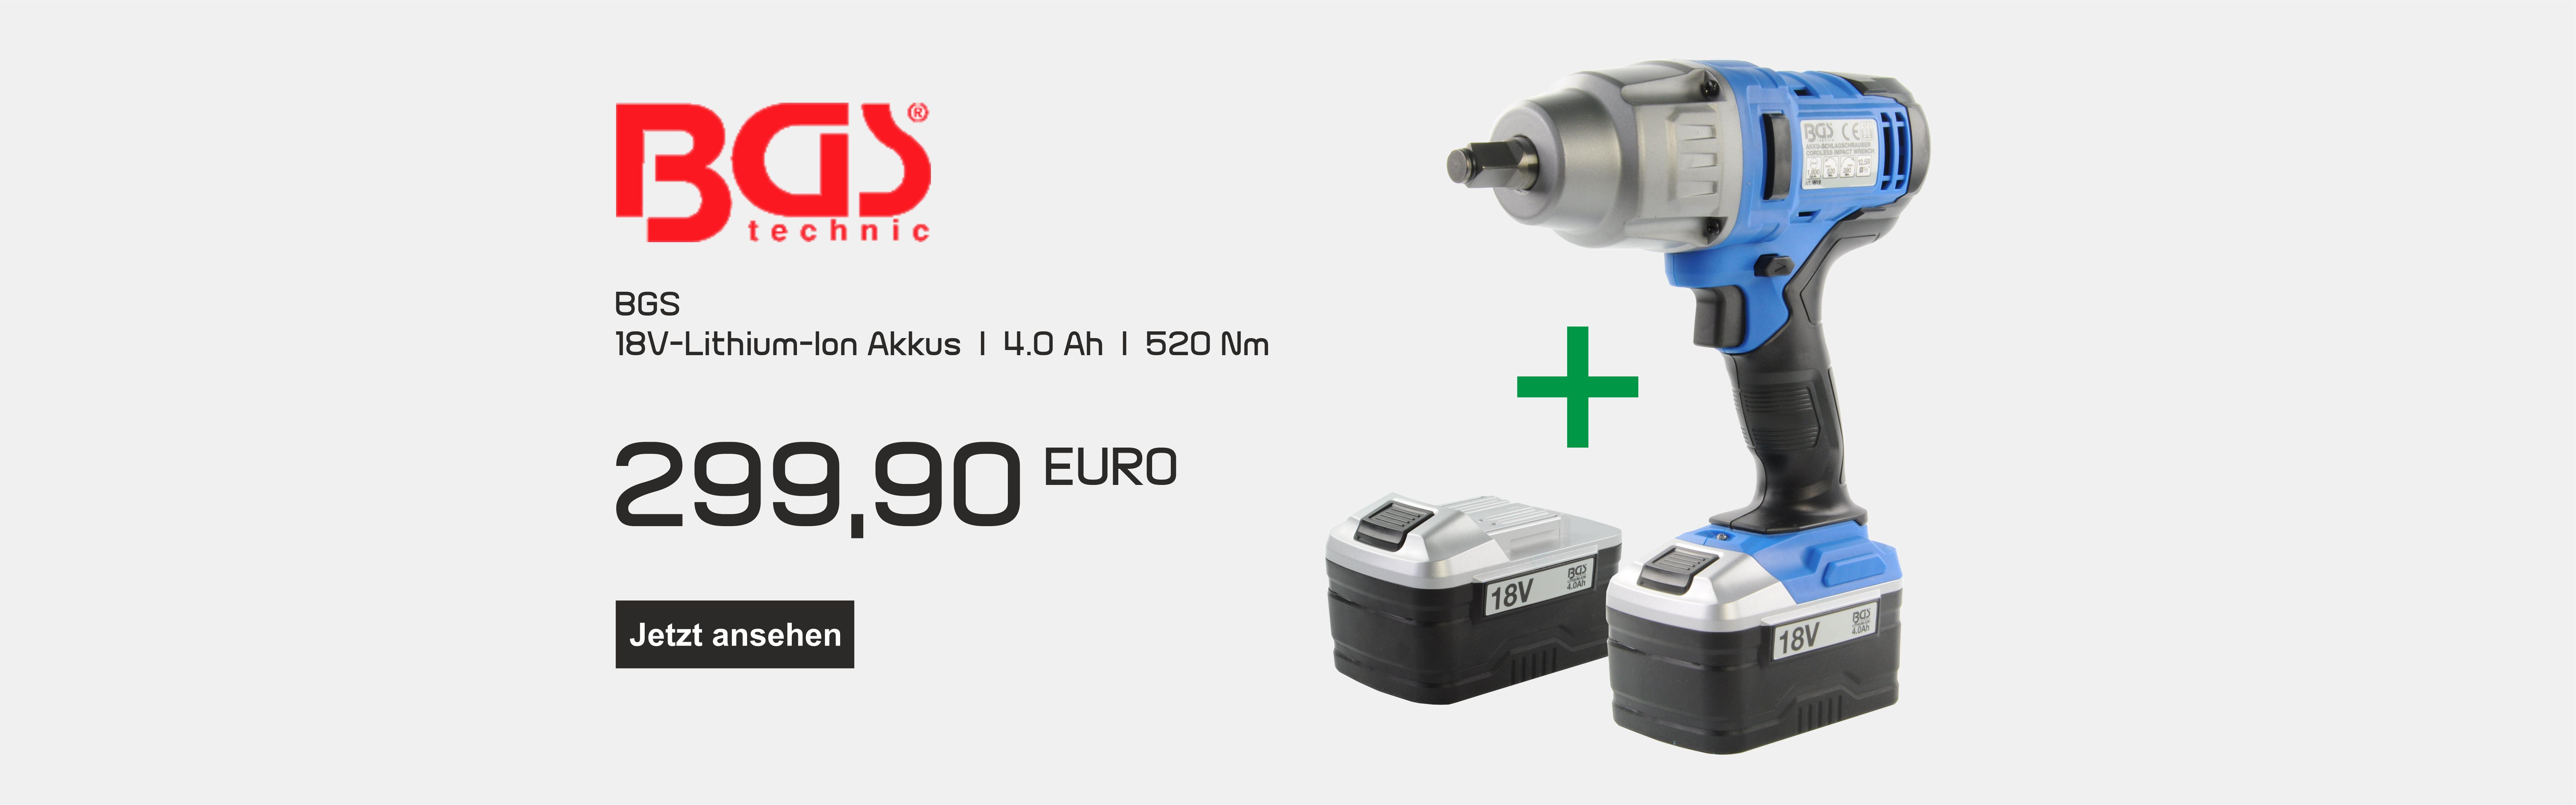 BGS 18V Lithion-Ion Schlagschrauber 4Ah 520 Max. Nm .